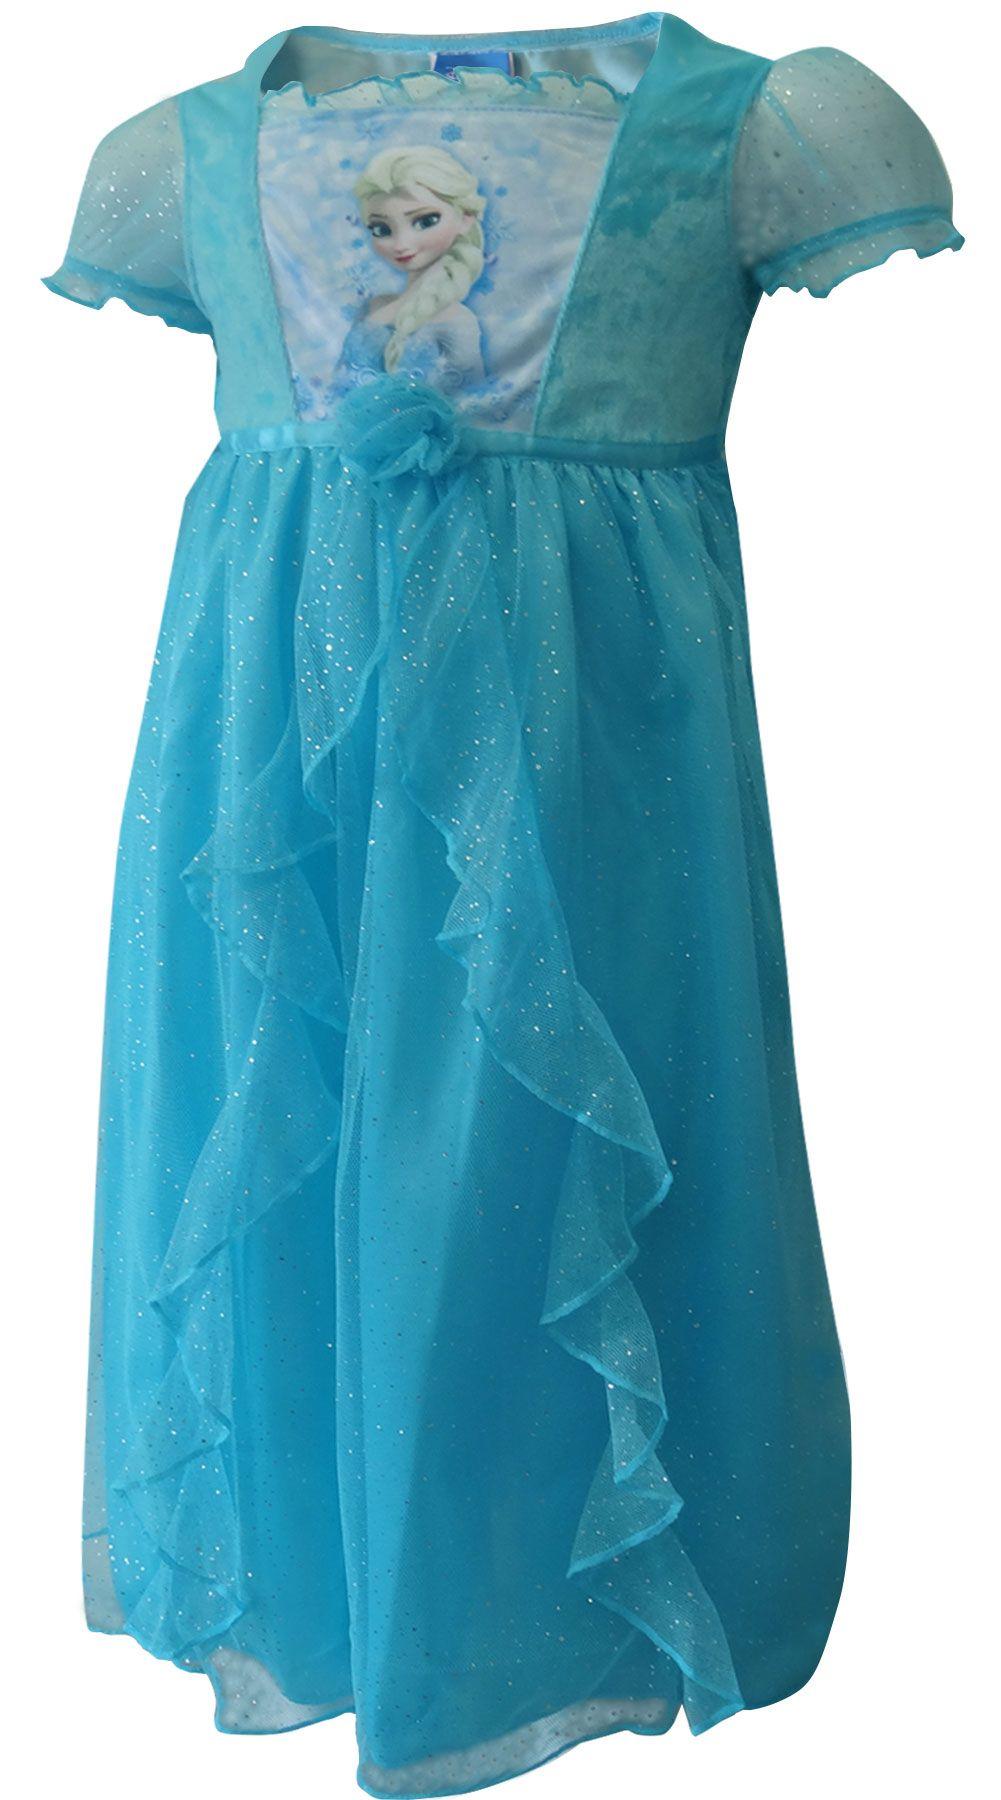 WebUndies.com Disney Frozen Princess Elsa Dress Up Toddler Nightgown ...